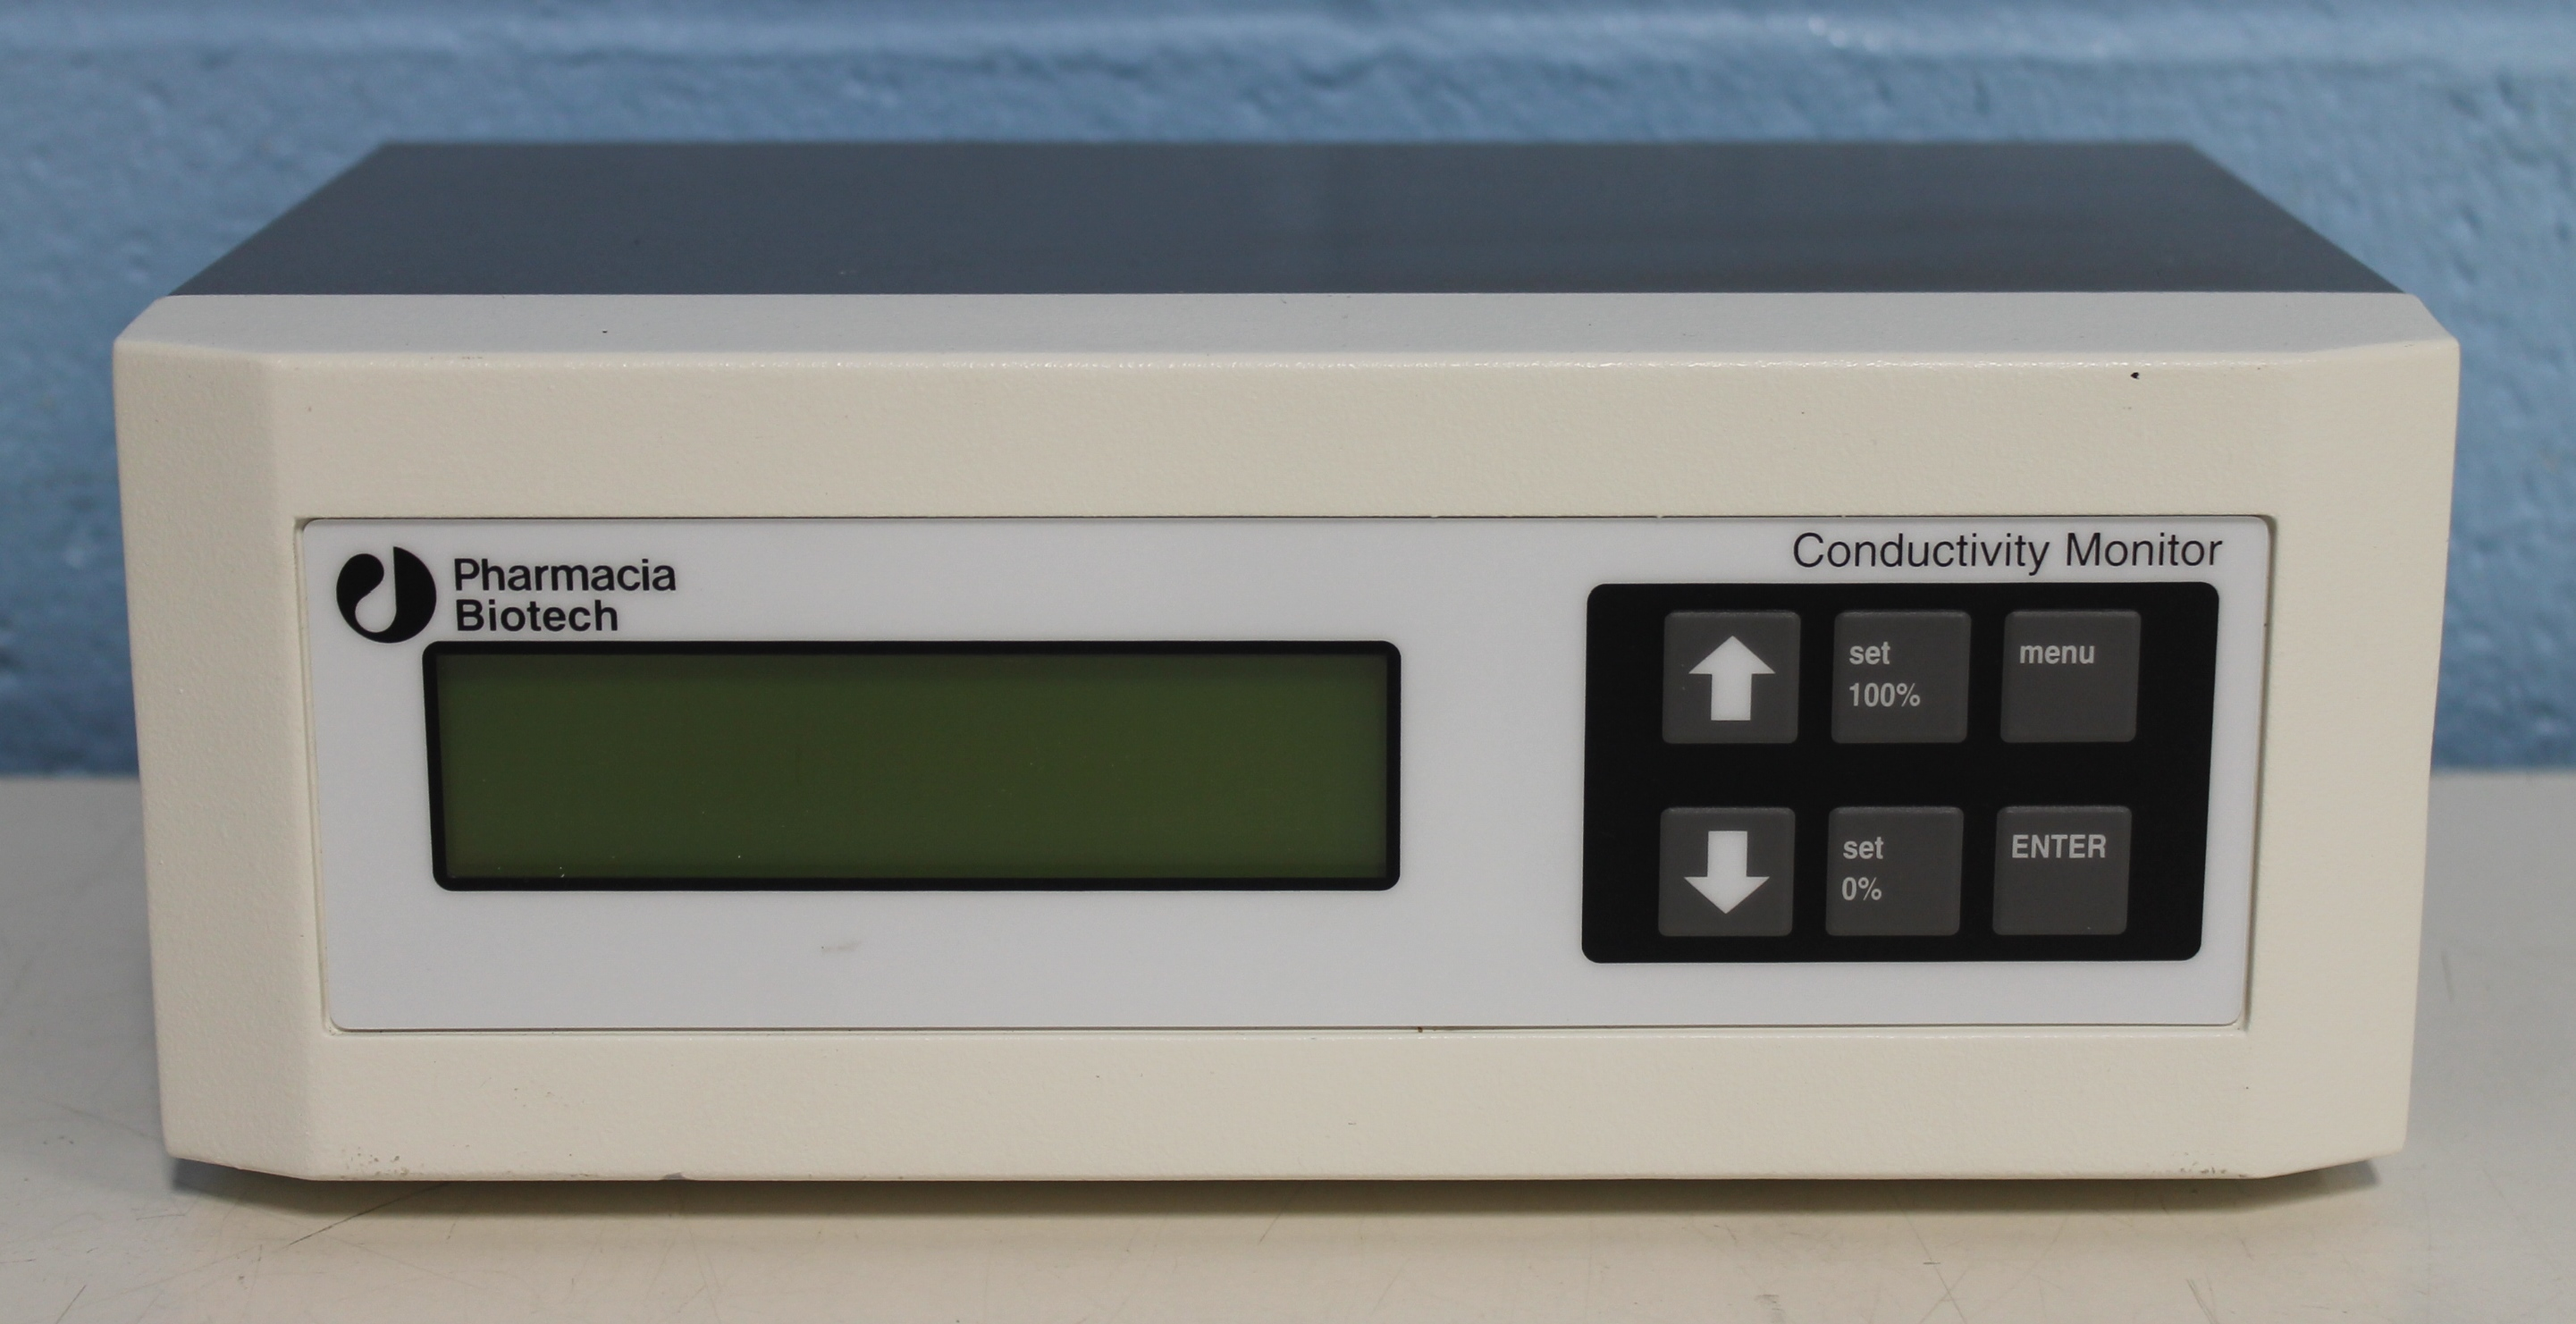 Pharmacia Biotech Conductivity Monitor Code No. 18-1500-00 Image